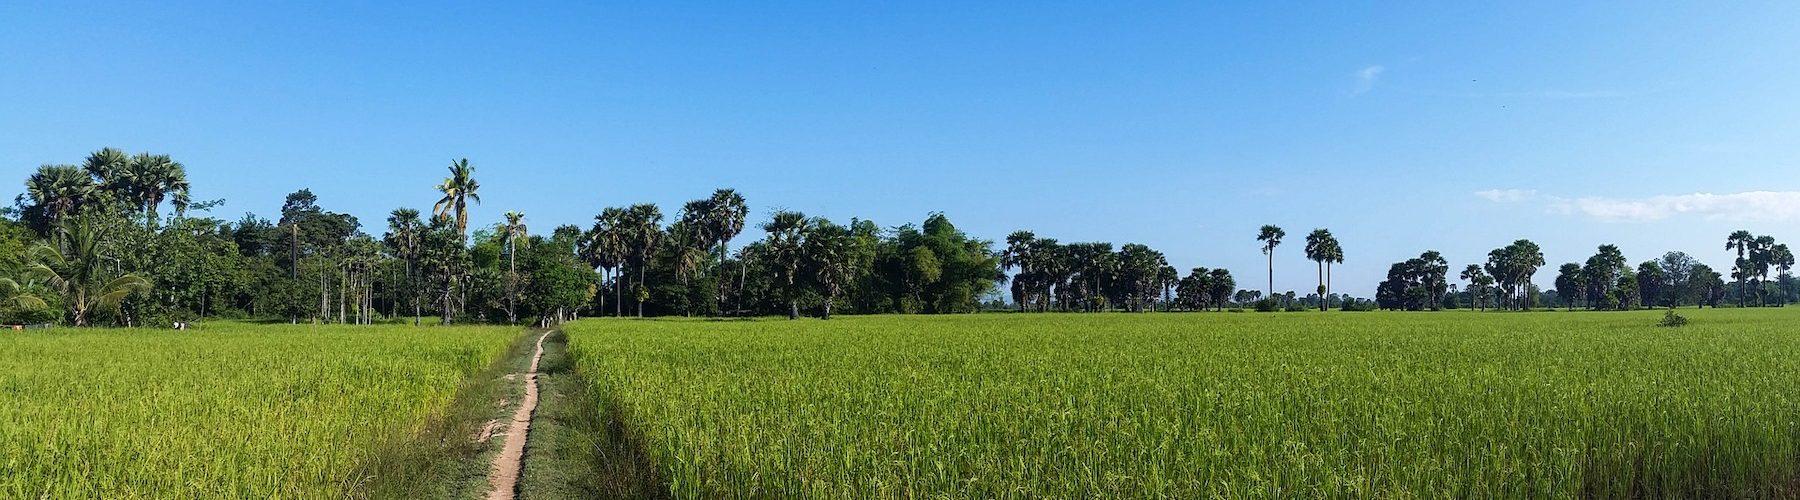 rice-fields-603416_1920